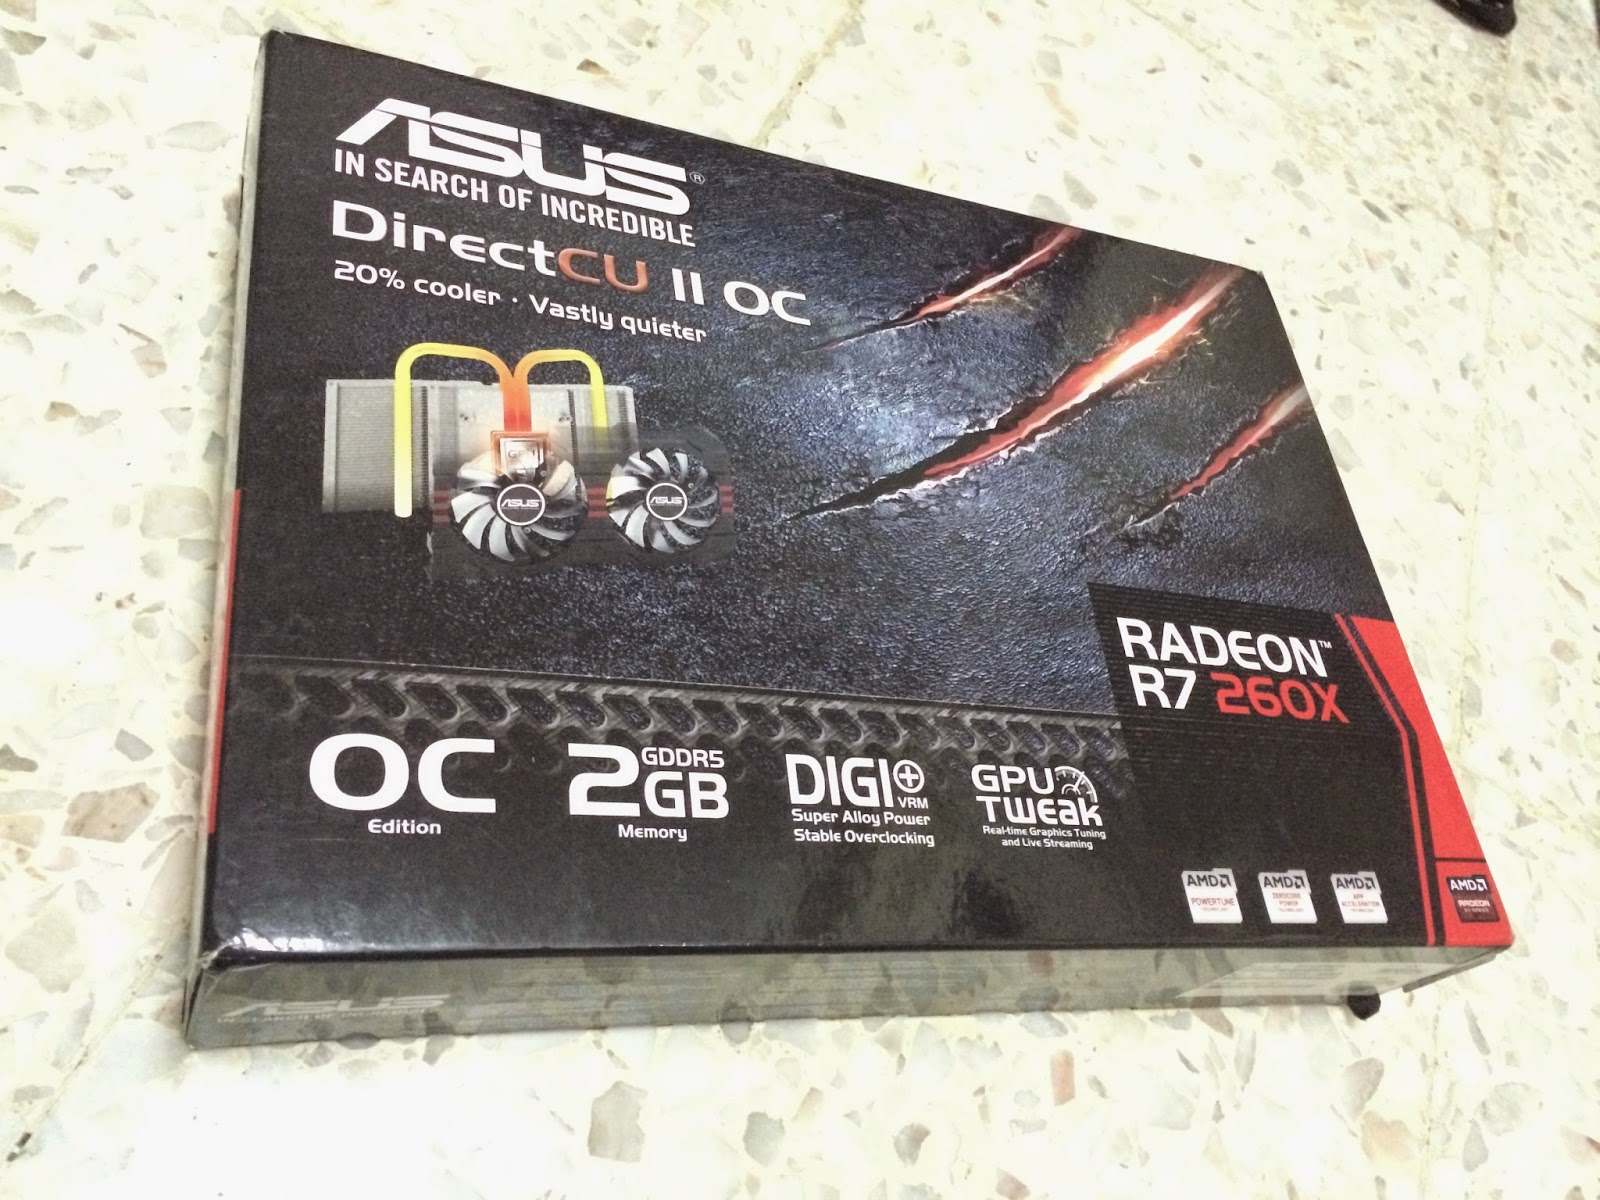 ASUS R7 260X DirectCU II Performance Review 3